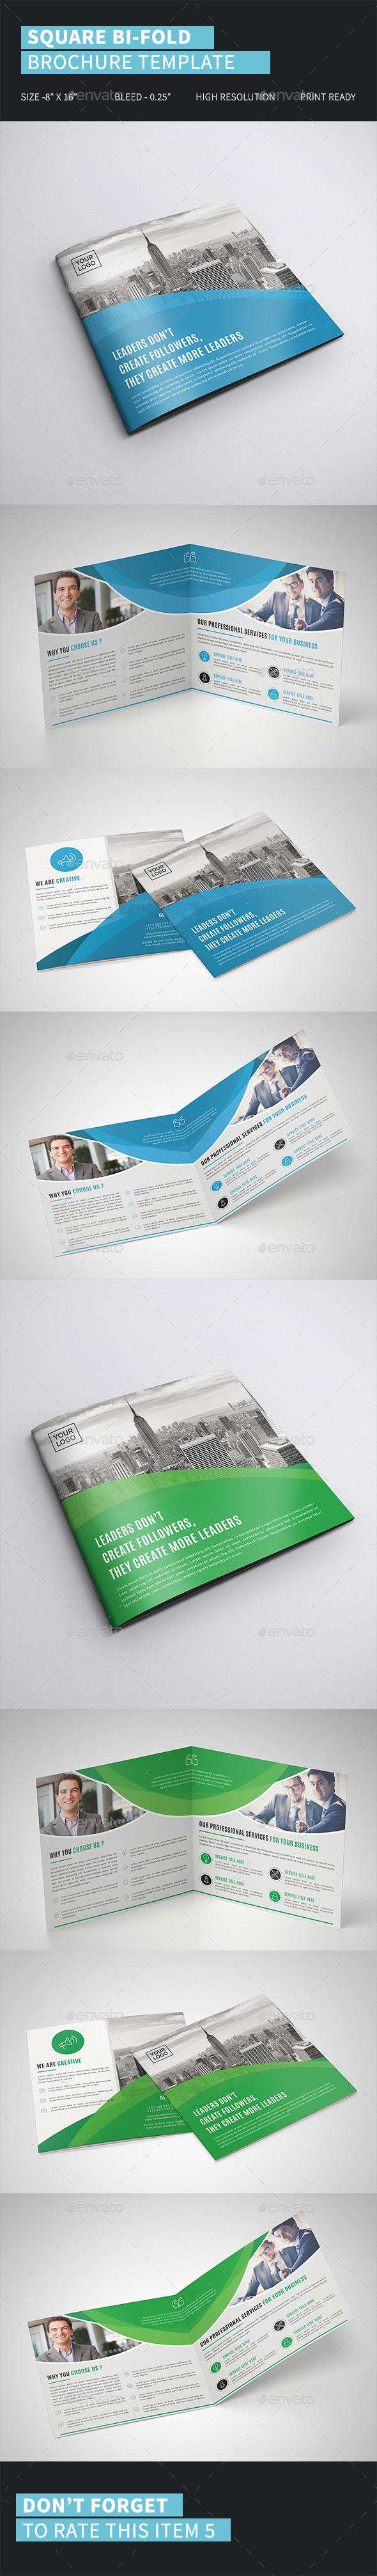 Square Bi-Fold Brochure Template - Corporate Brochures